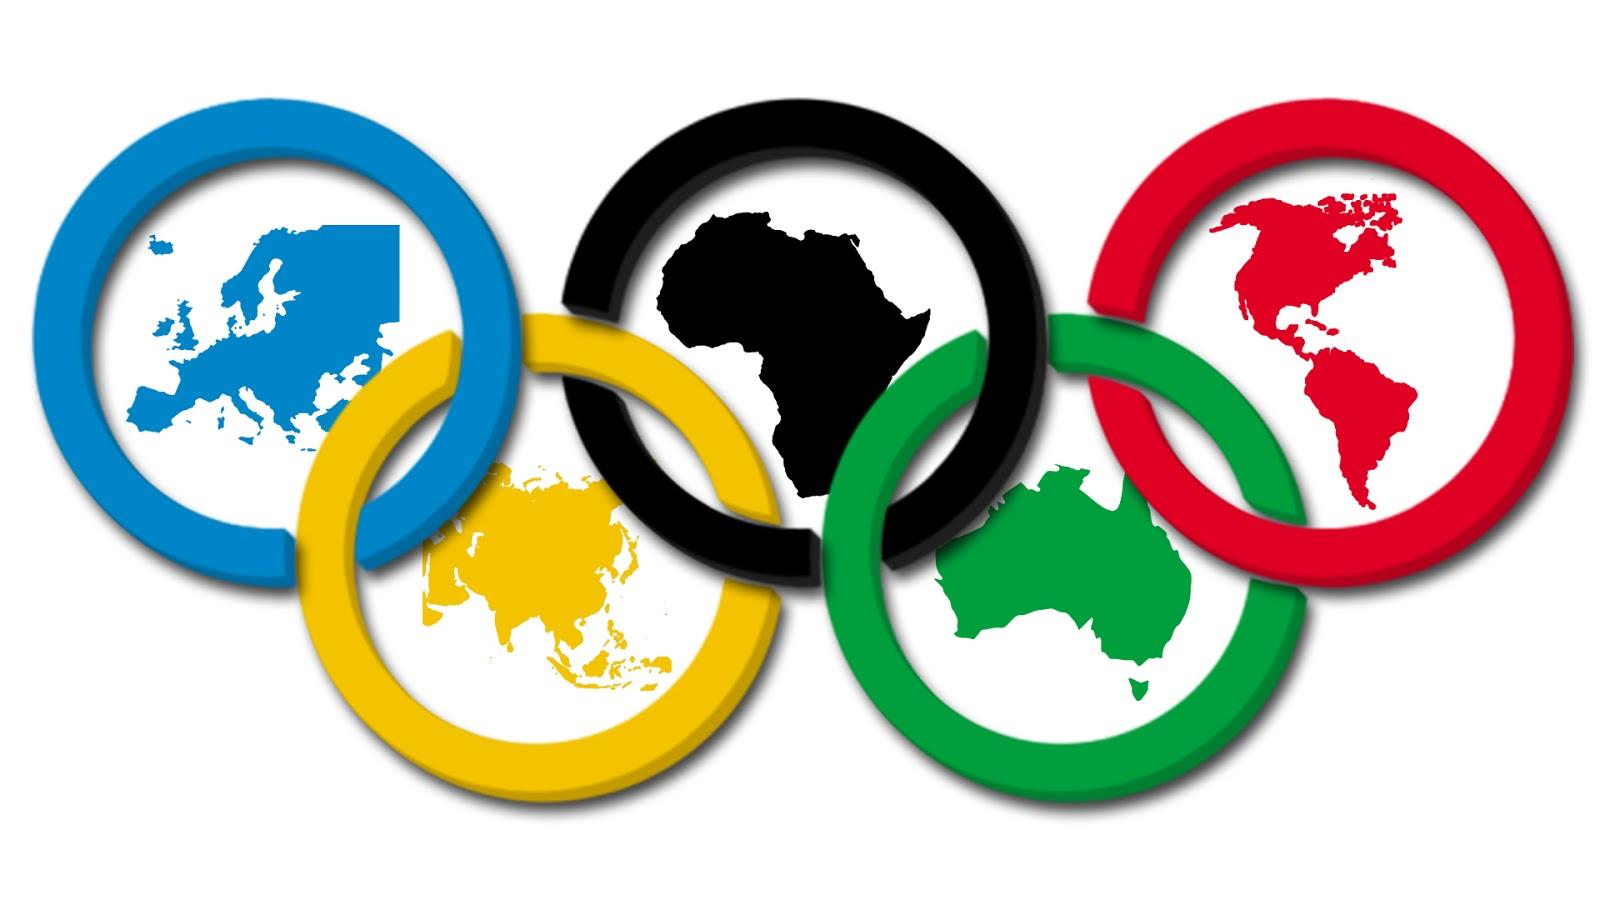 Olympic symbol olympics olympic symbololympic symbololympic symbol 2016olympic symbol meaningolympic symbol imageolympic symbol crosswordolympic symbol emojiolympic symbol buycottarizona Image collections